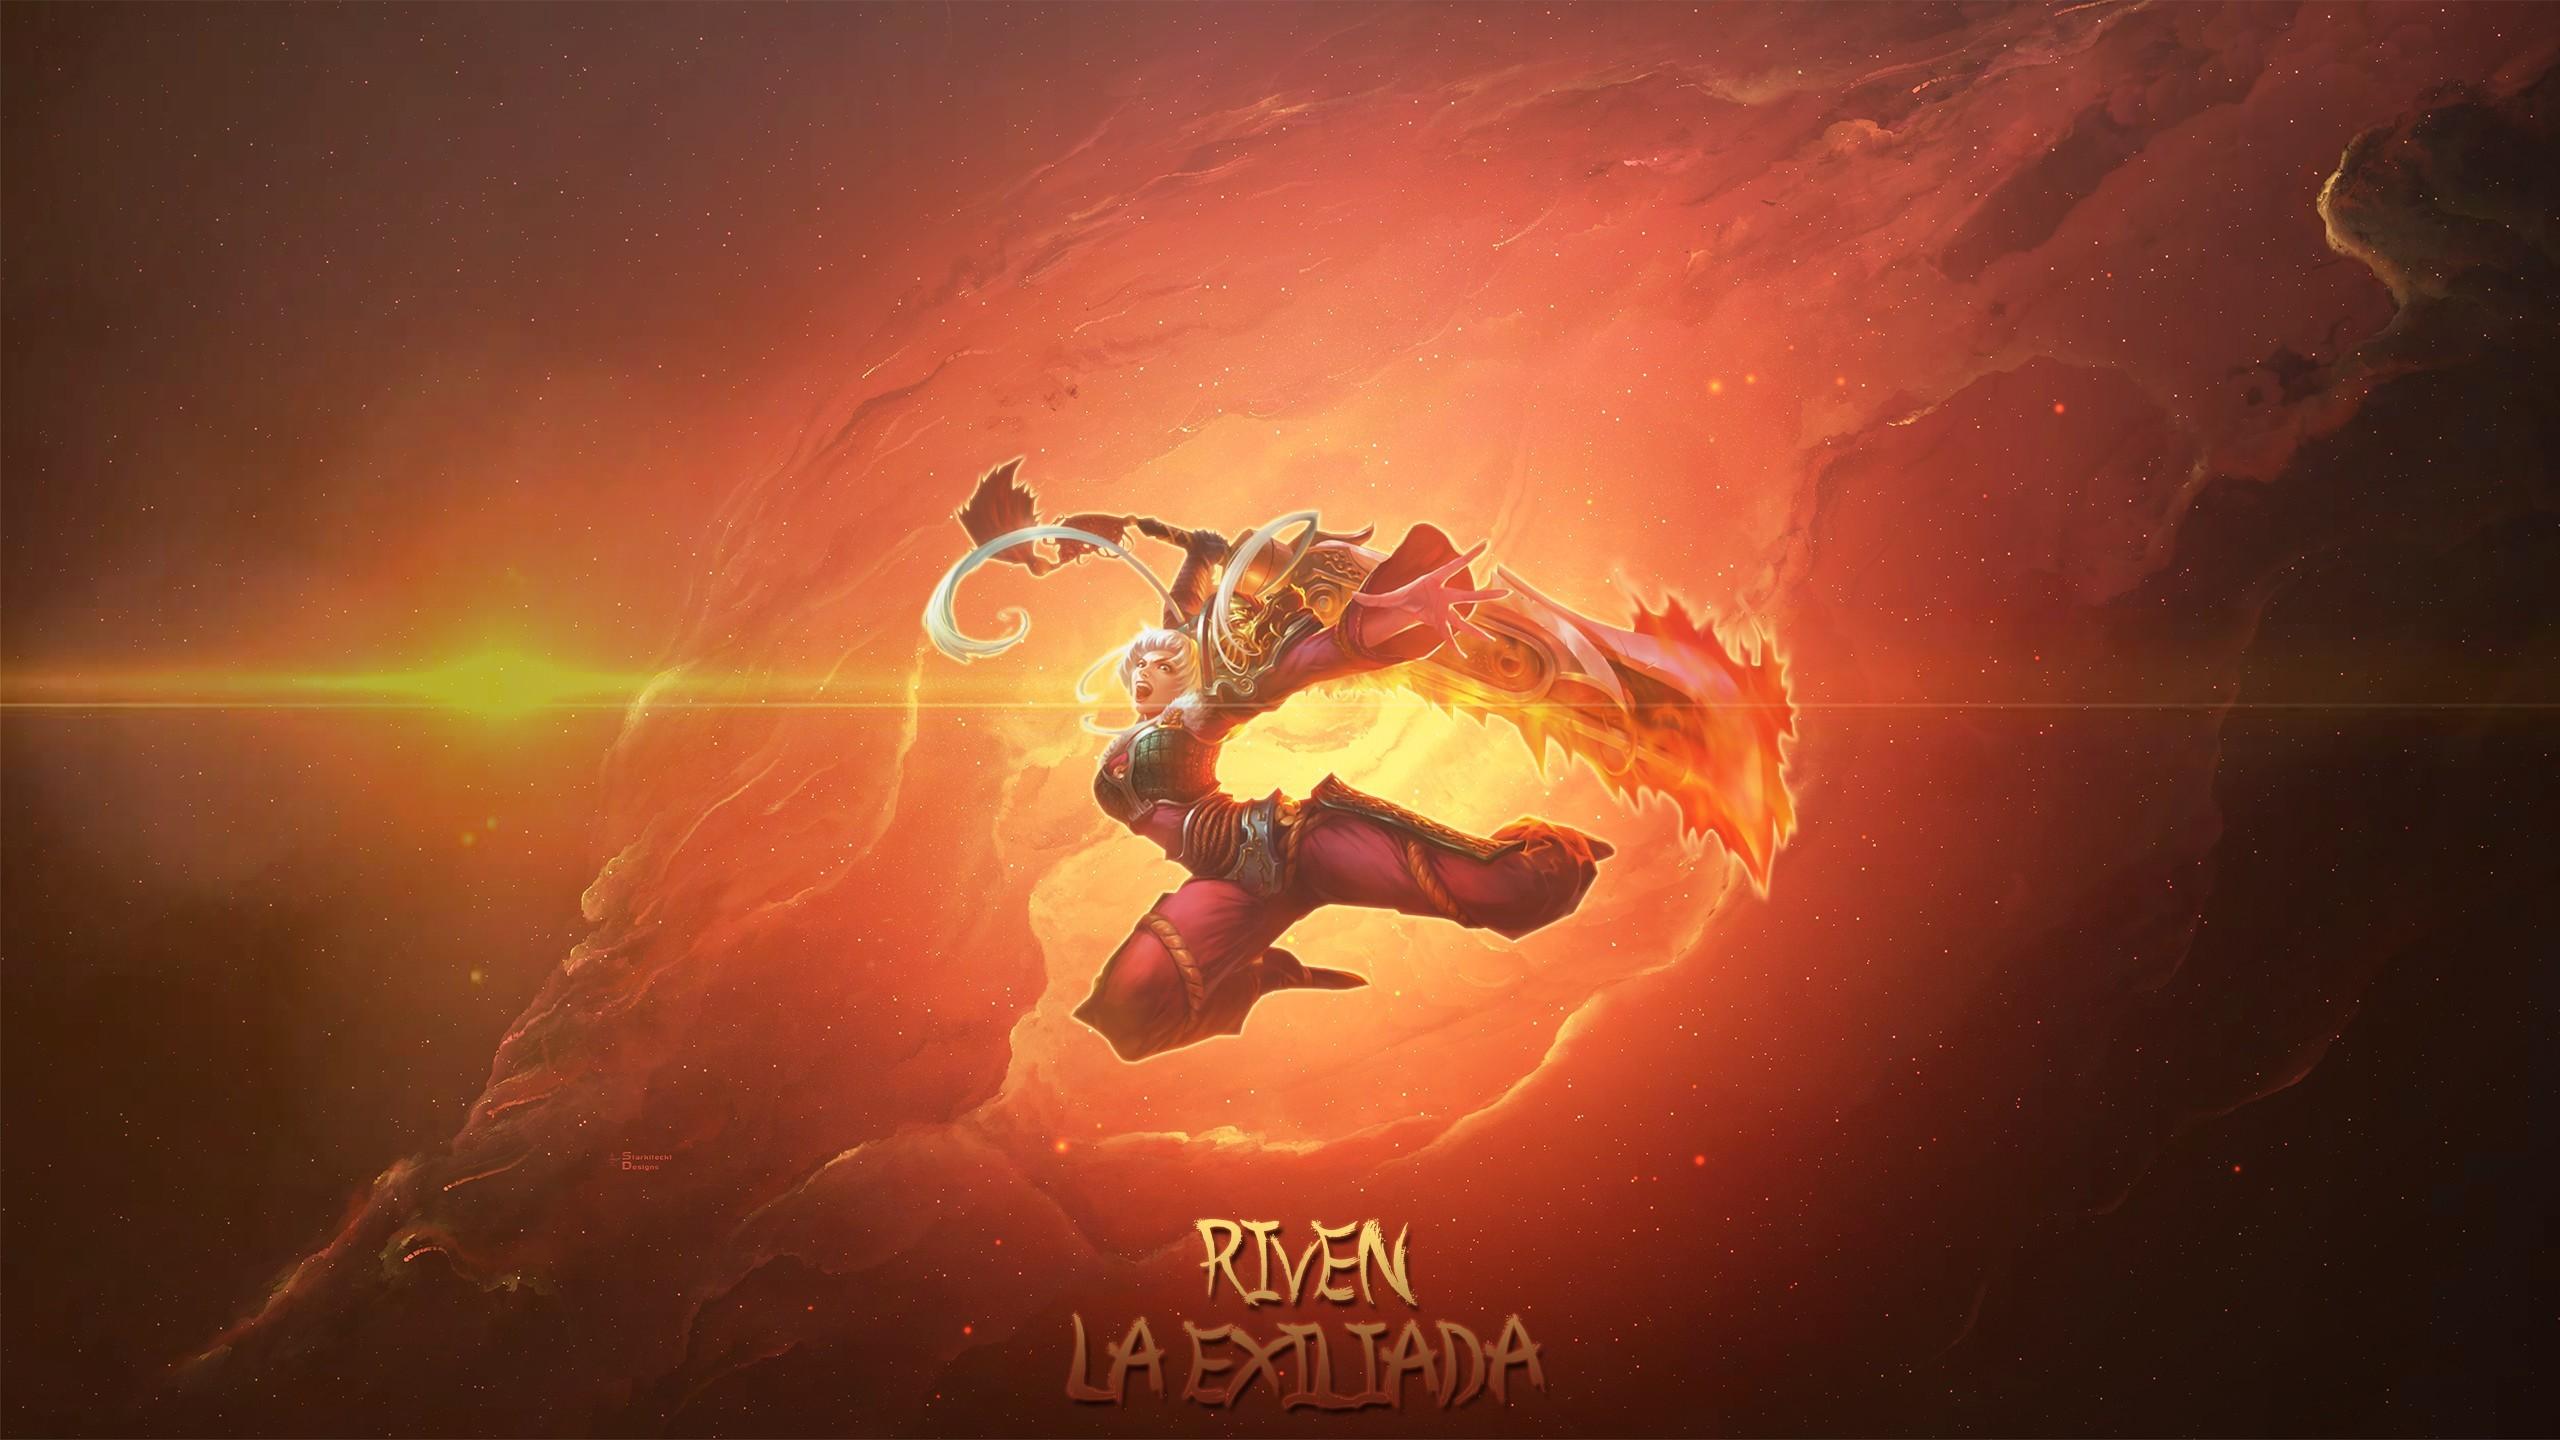 General Summoner's Rift Riven (League of Legends) solid color